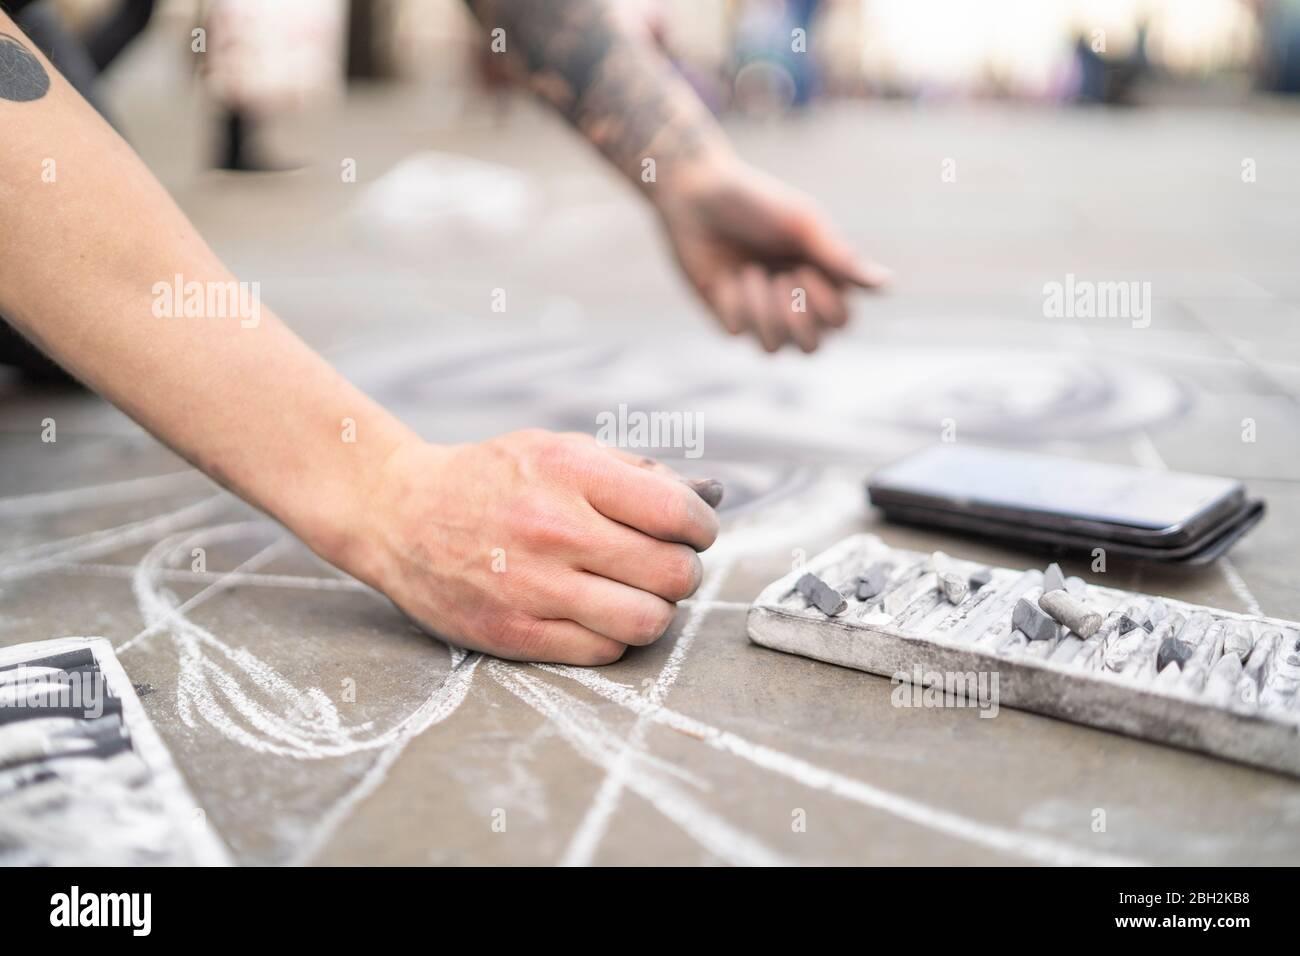 Street art, pavement artist drawing on pavement and using smartphone Stock Photo